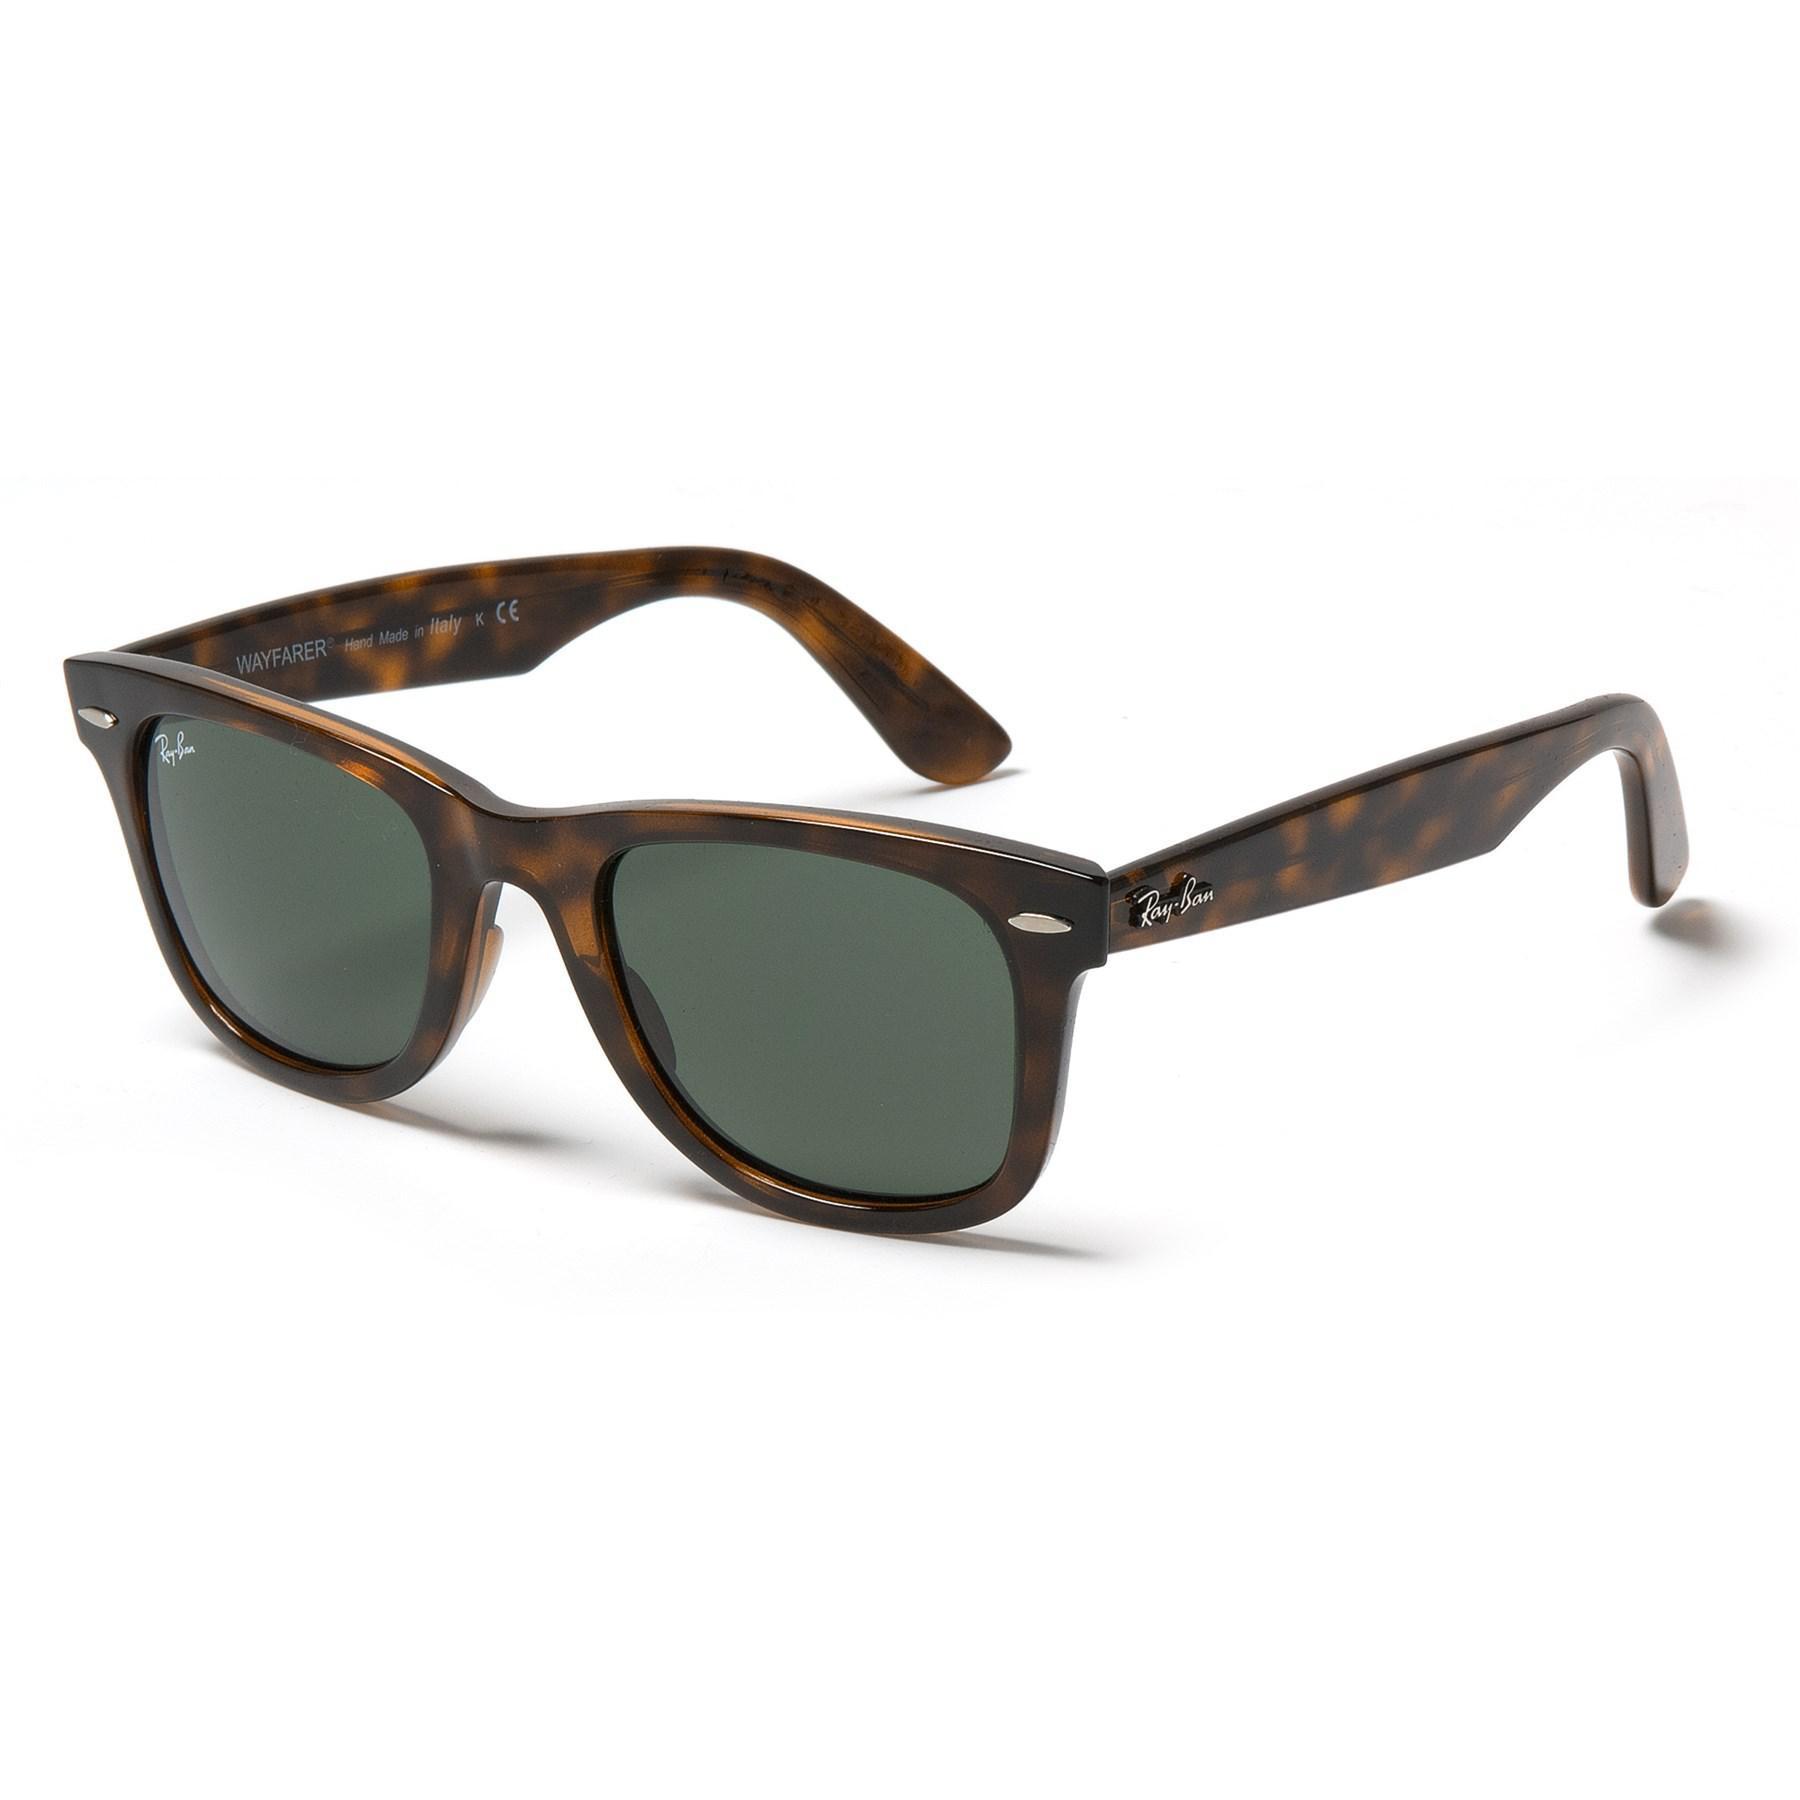 06158dc1e1 Lyst - Ray-Ban Rb4340 Wayfarer Ease Sunglasses in Green for Men